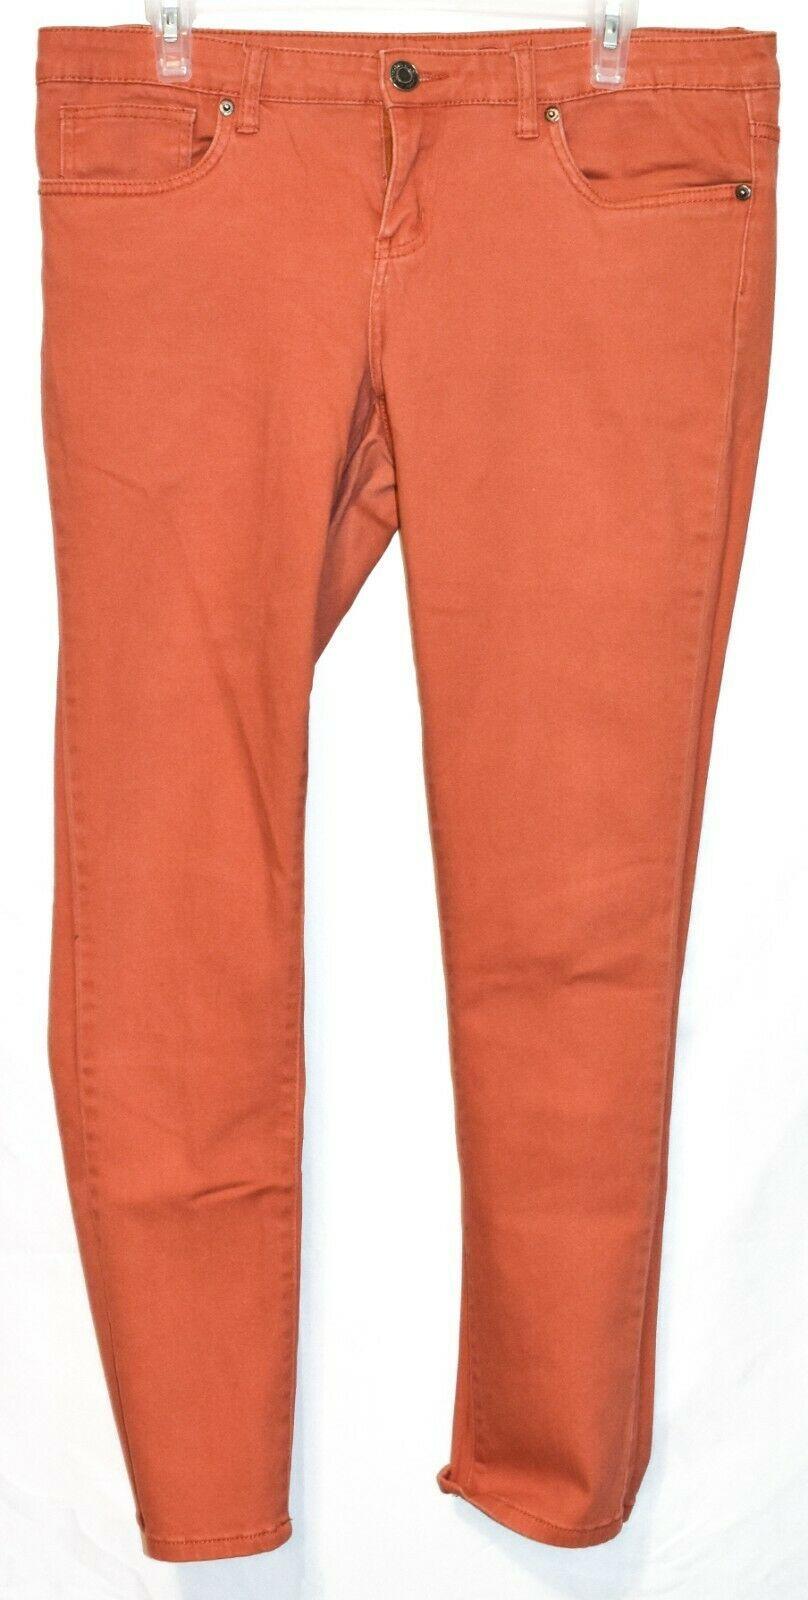 Rue 21 Women's Tomato Red Orange Mid-Rise Skinny Jeans Size 11/12